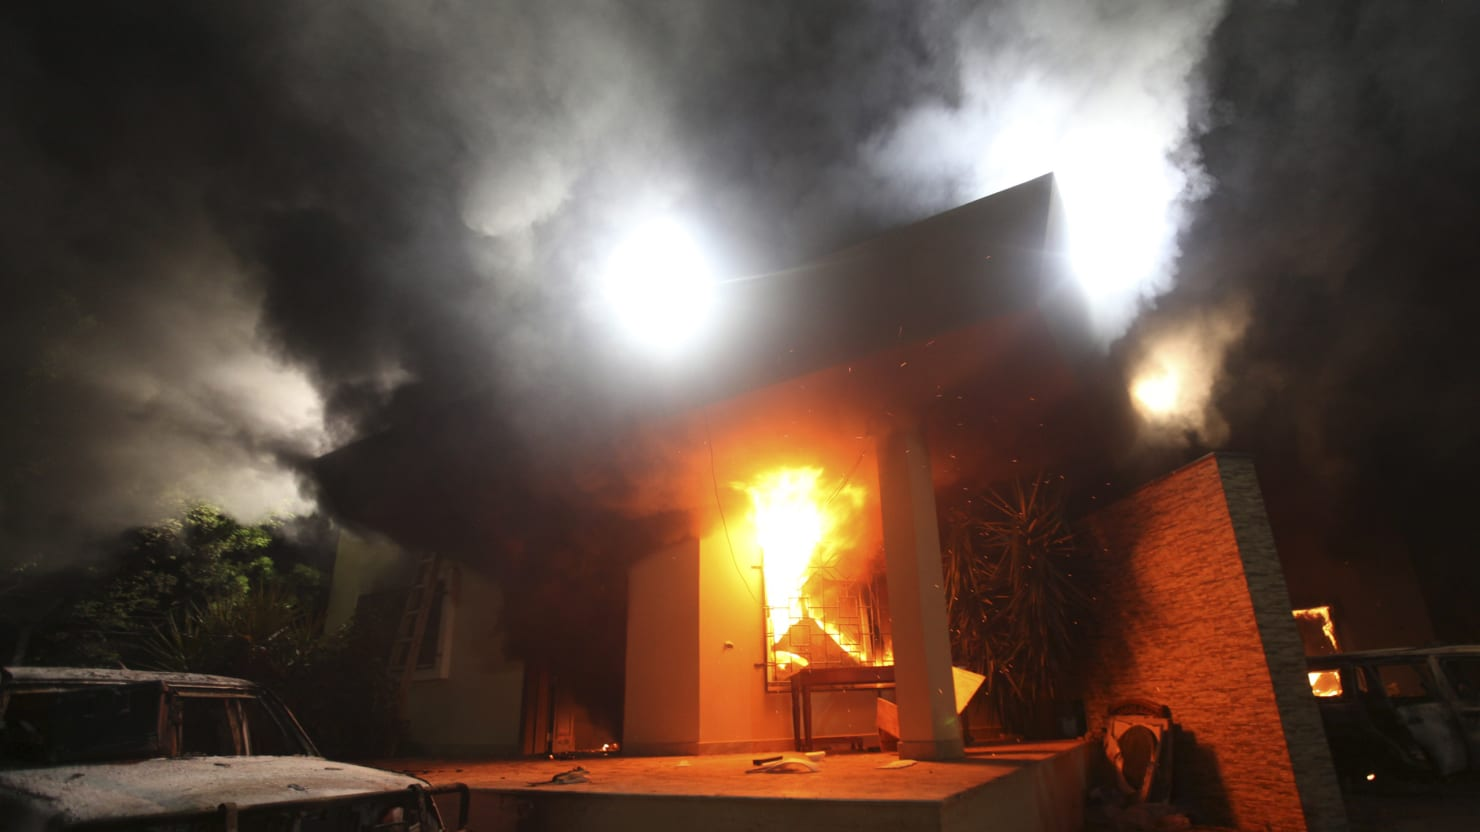 Obama Administration Accused Of Slow Walking Congress On Benghazi